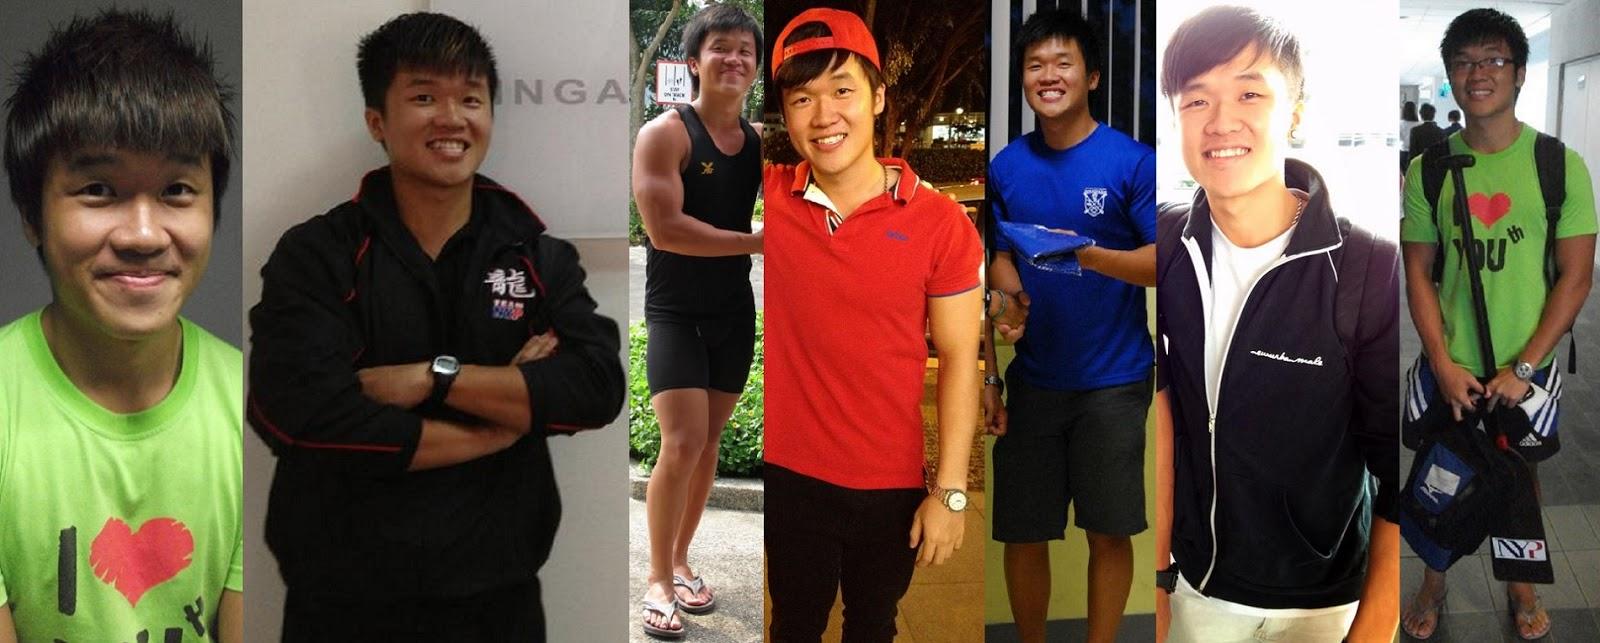 ManSA (Manhunt Singapore Alumni): THE AGE OF INNOCENCE